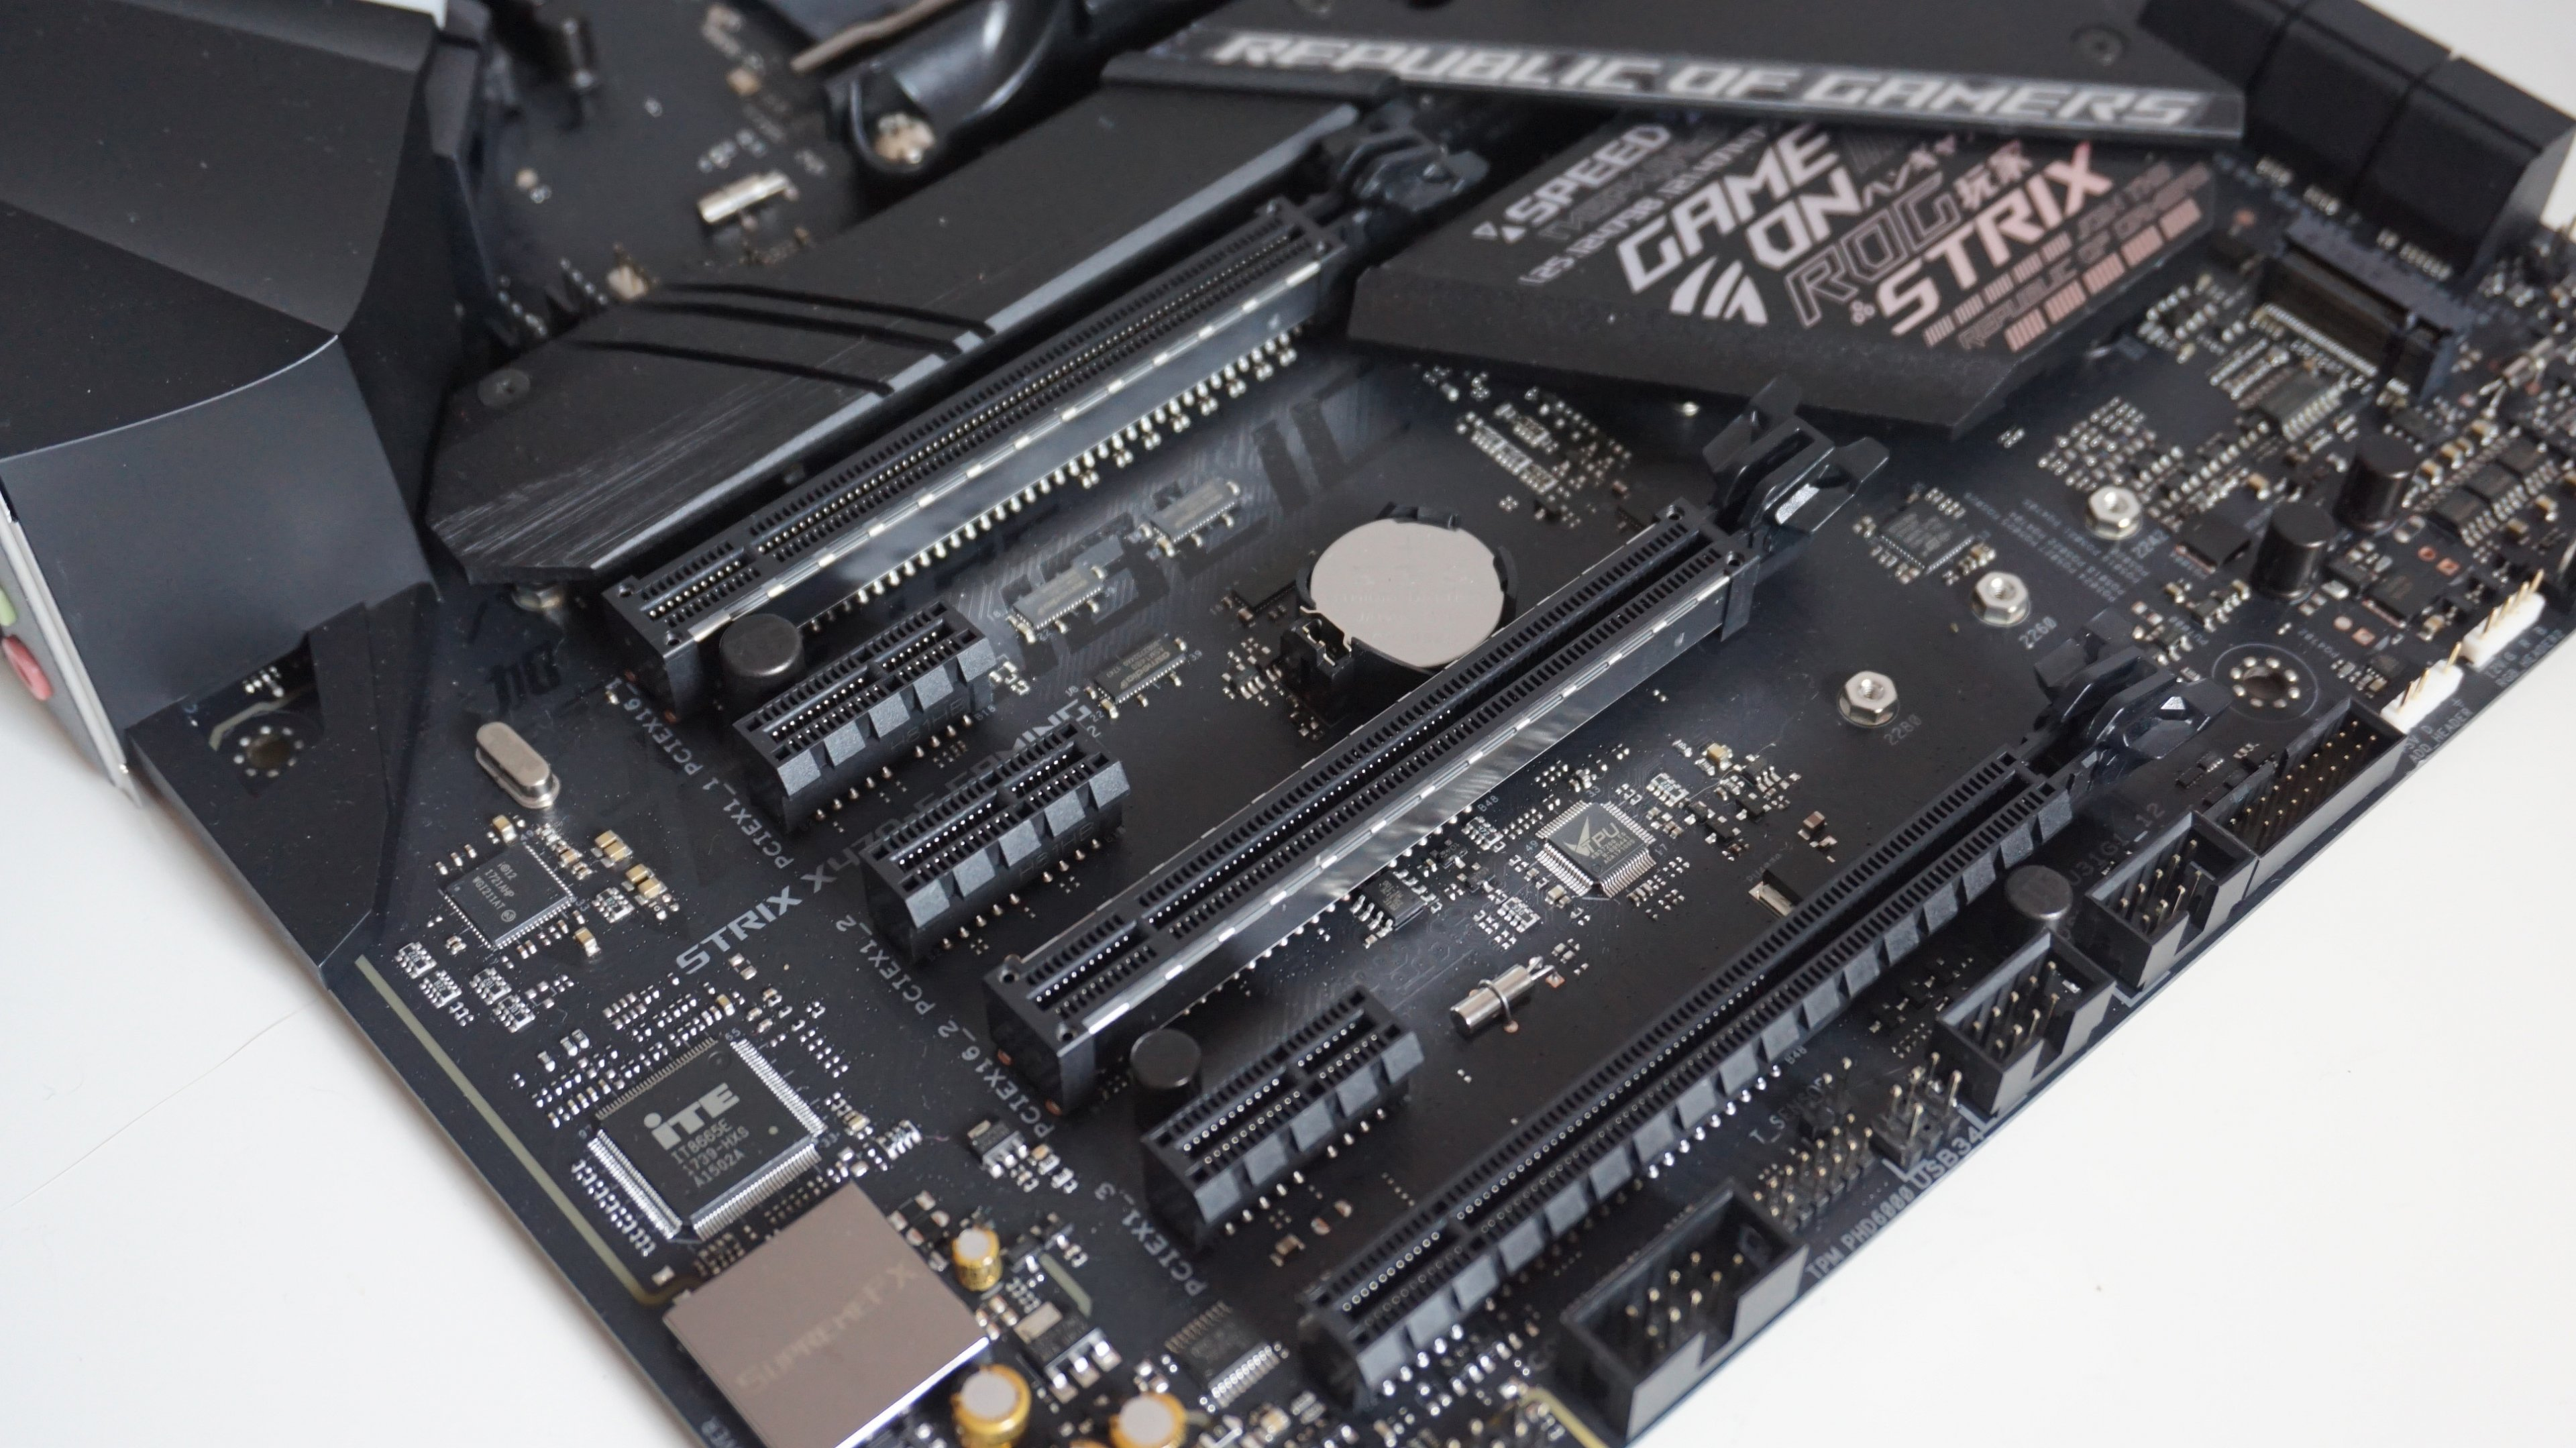 Asus-ROG-Strix-X470F-Gaming-PCIe (1).jpg